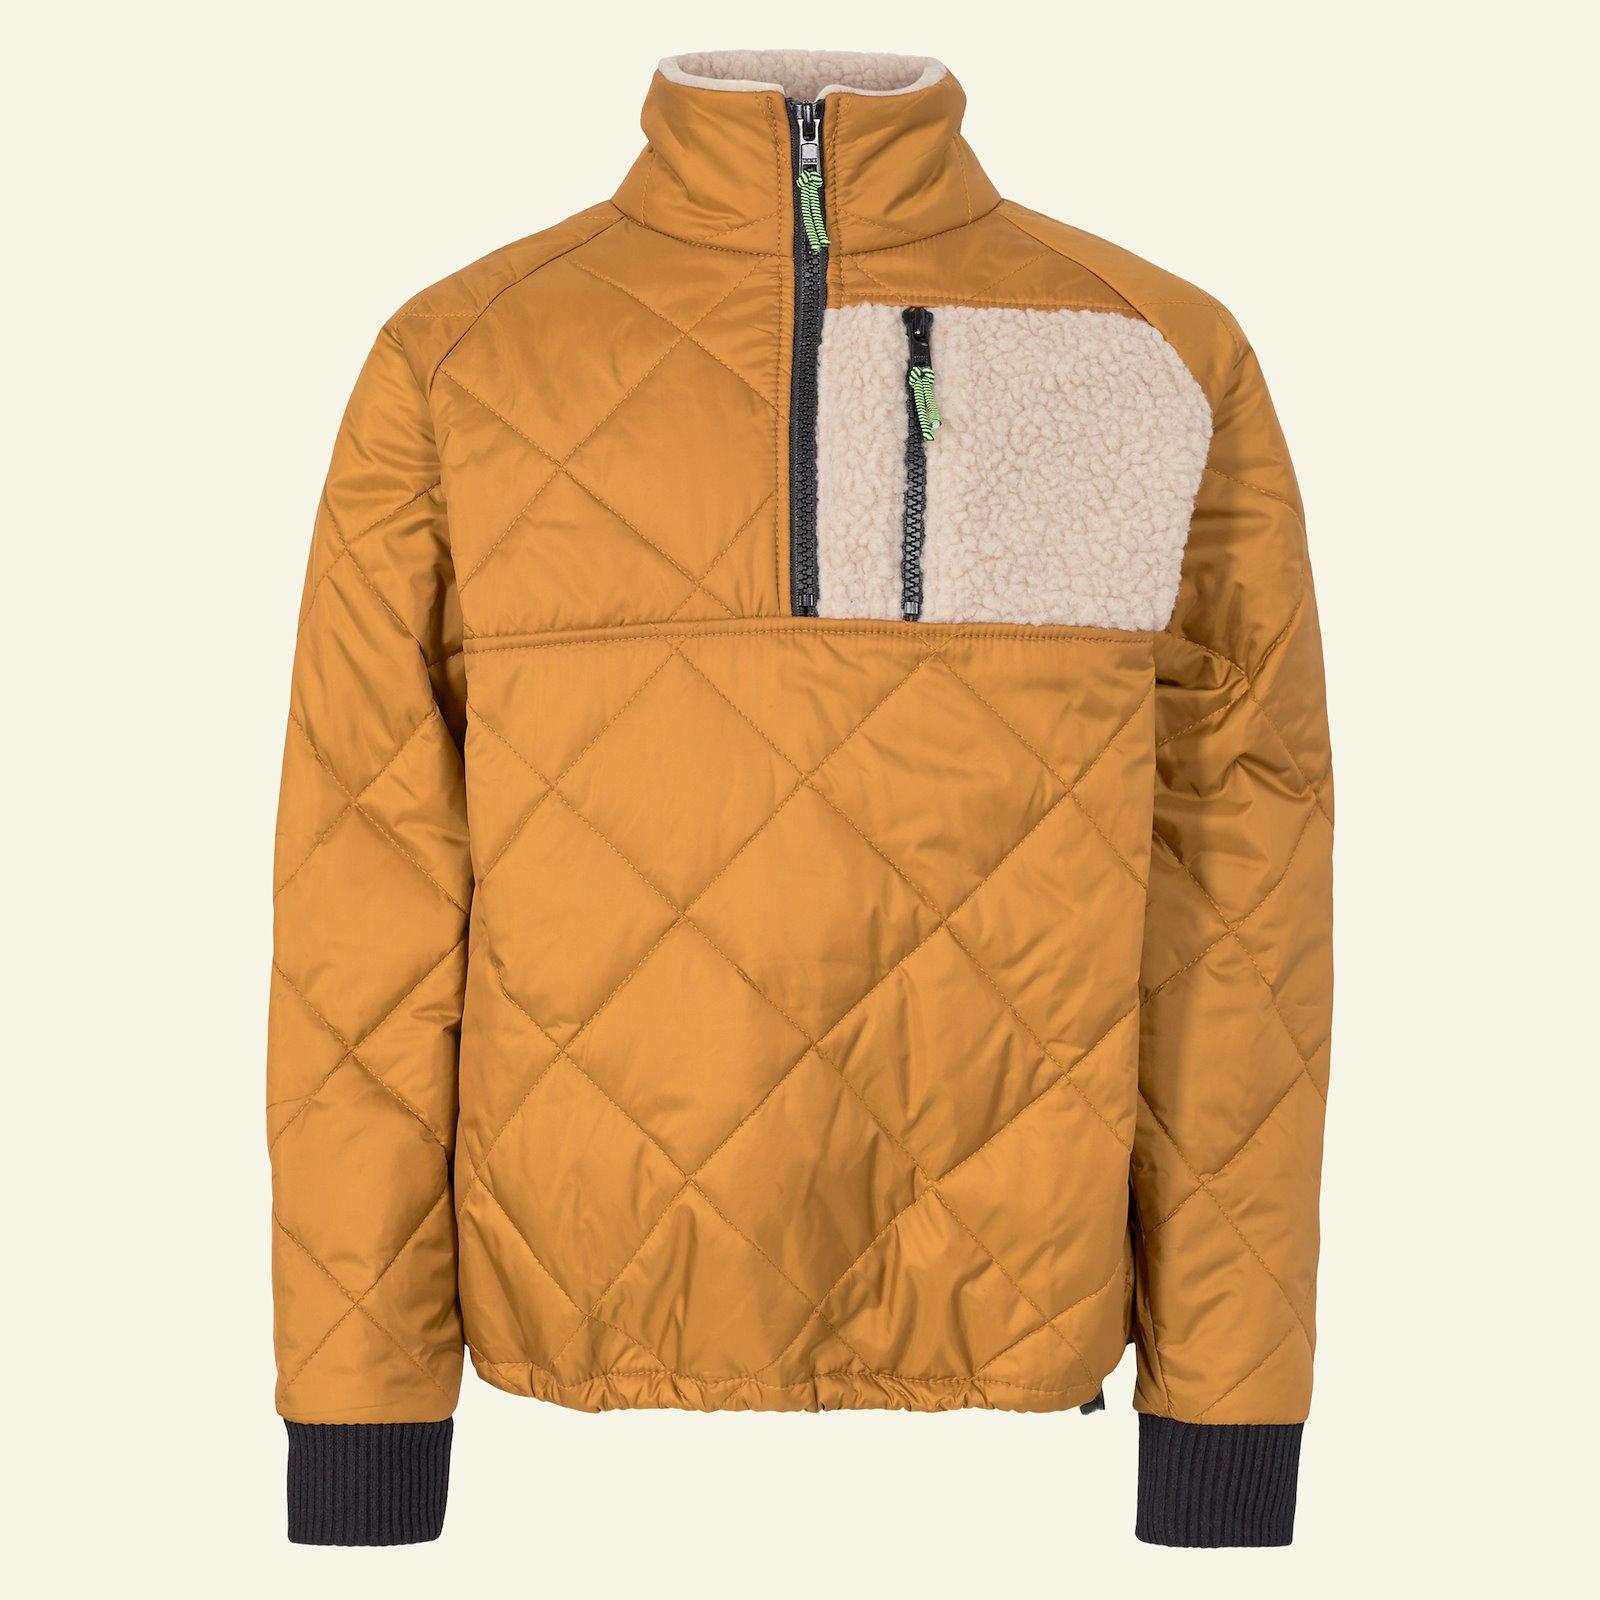 Anorak and jacket, 122/7y p64020_920218_910273_3509072_sskit